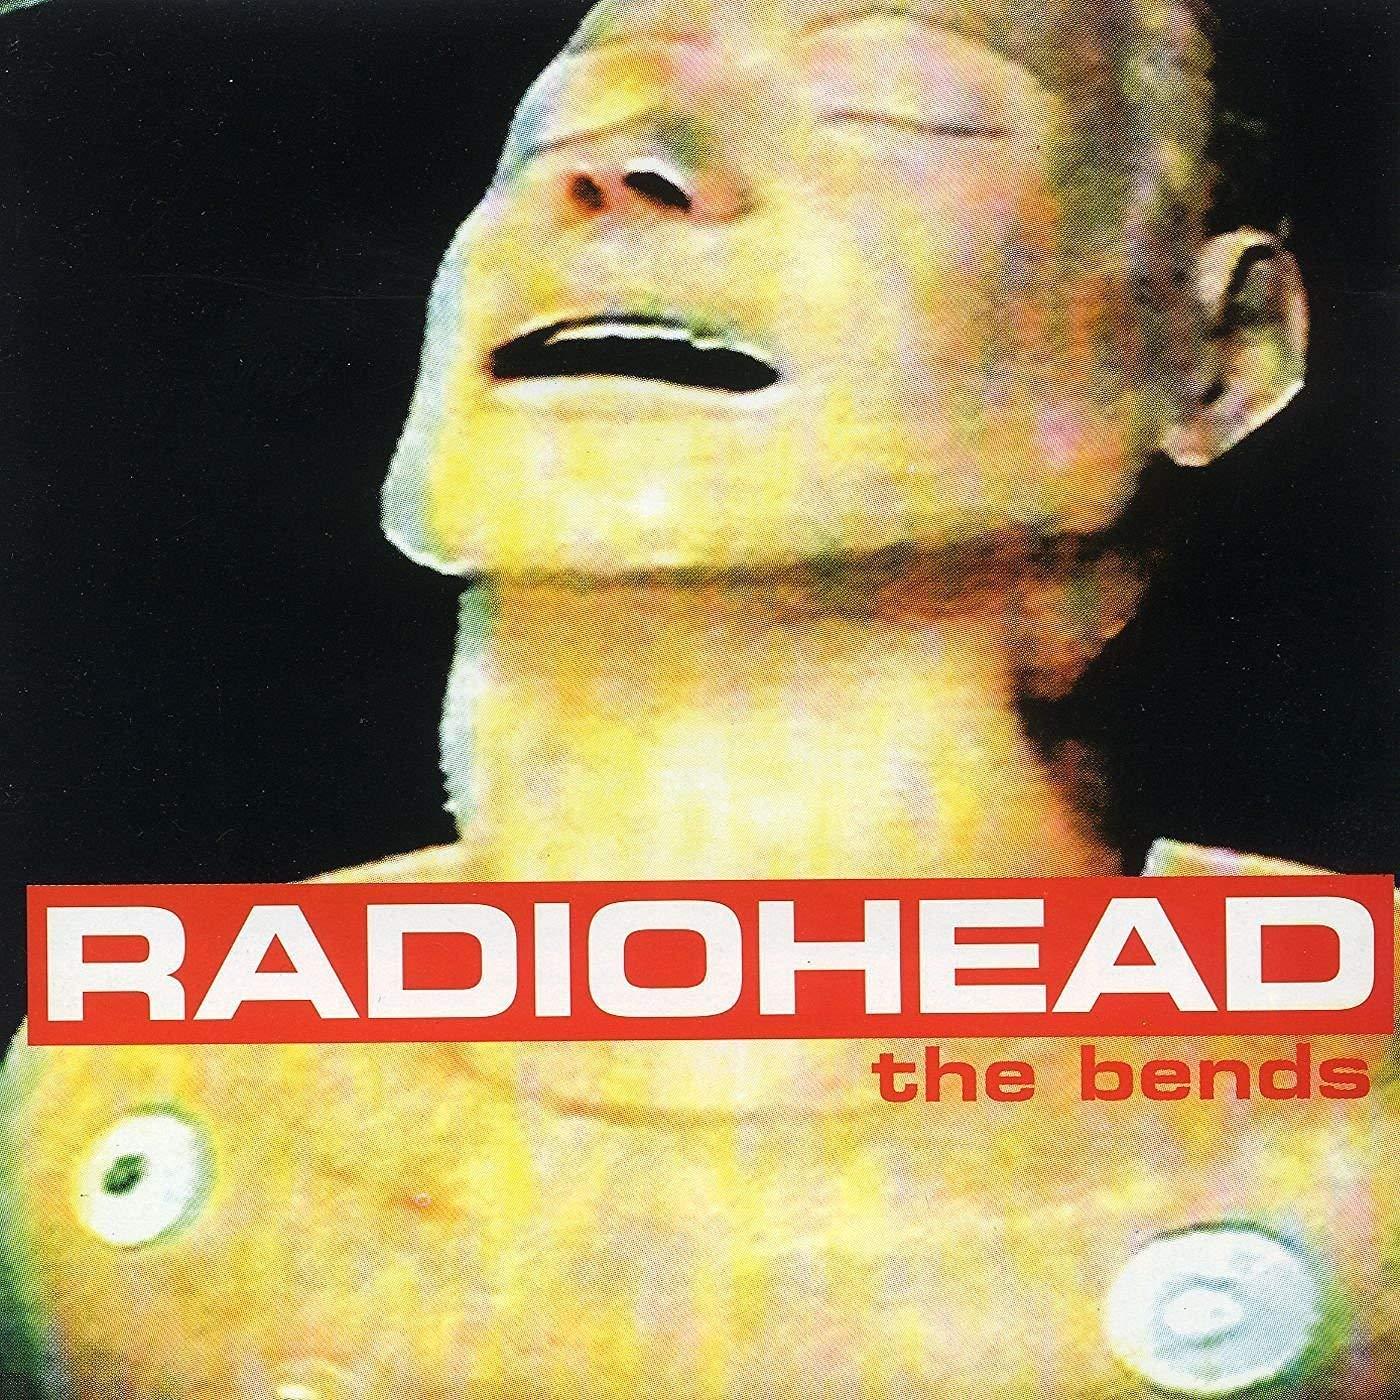 Radiohead - The Bends on Vinyl - £15.99 @ Amazon Prime (+£2.99 Non-Prime)